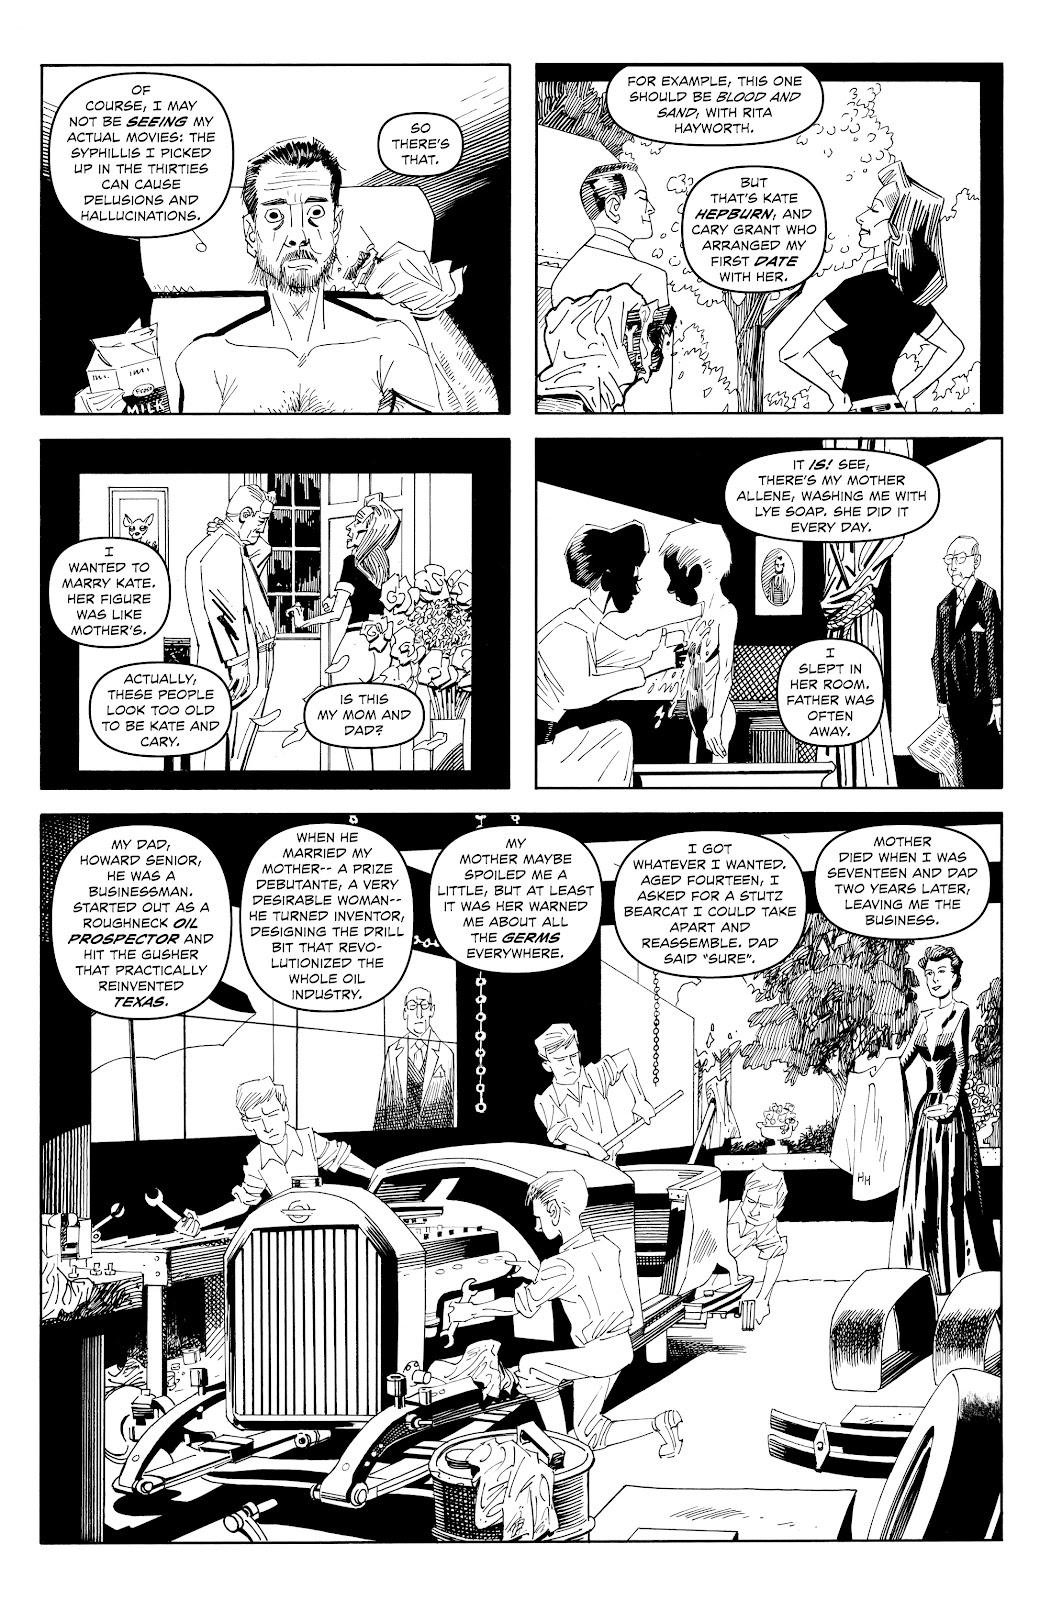 Read online Alan Moore's Cinema Purgatorio comic -  Issue #17 - 7